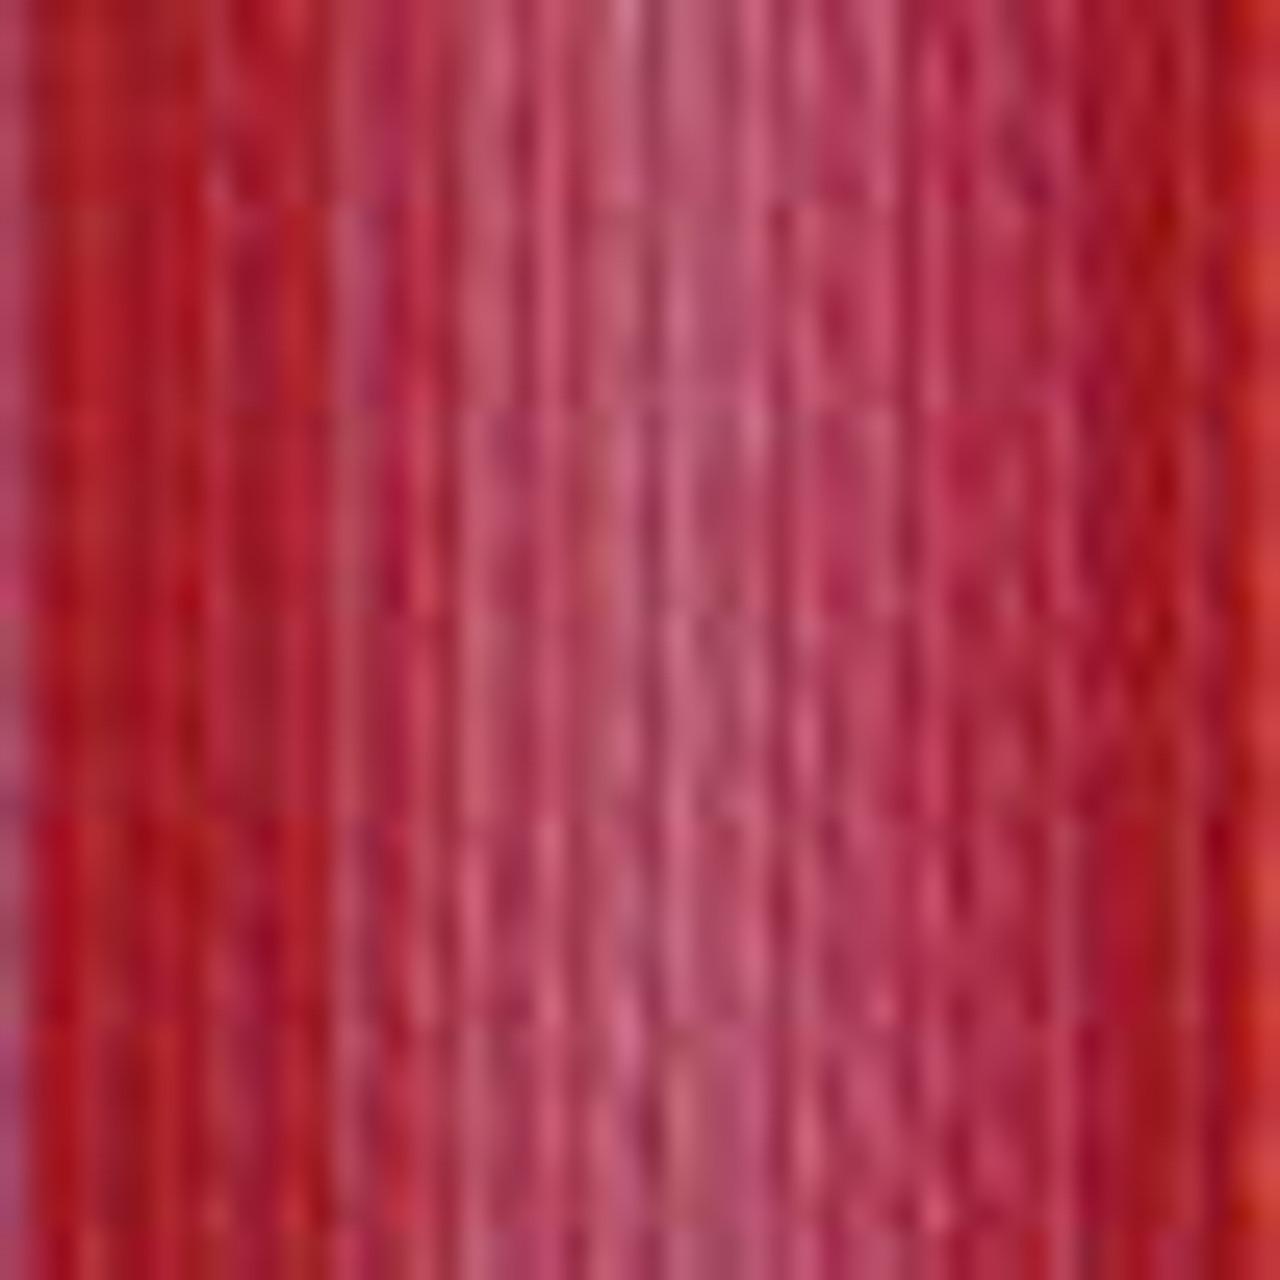 DMC # 107 Variegated Carnation Floss / Thread